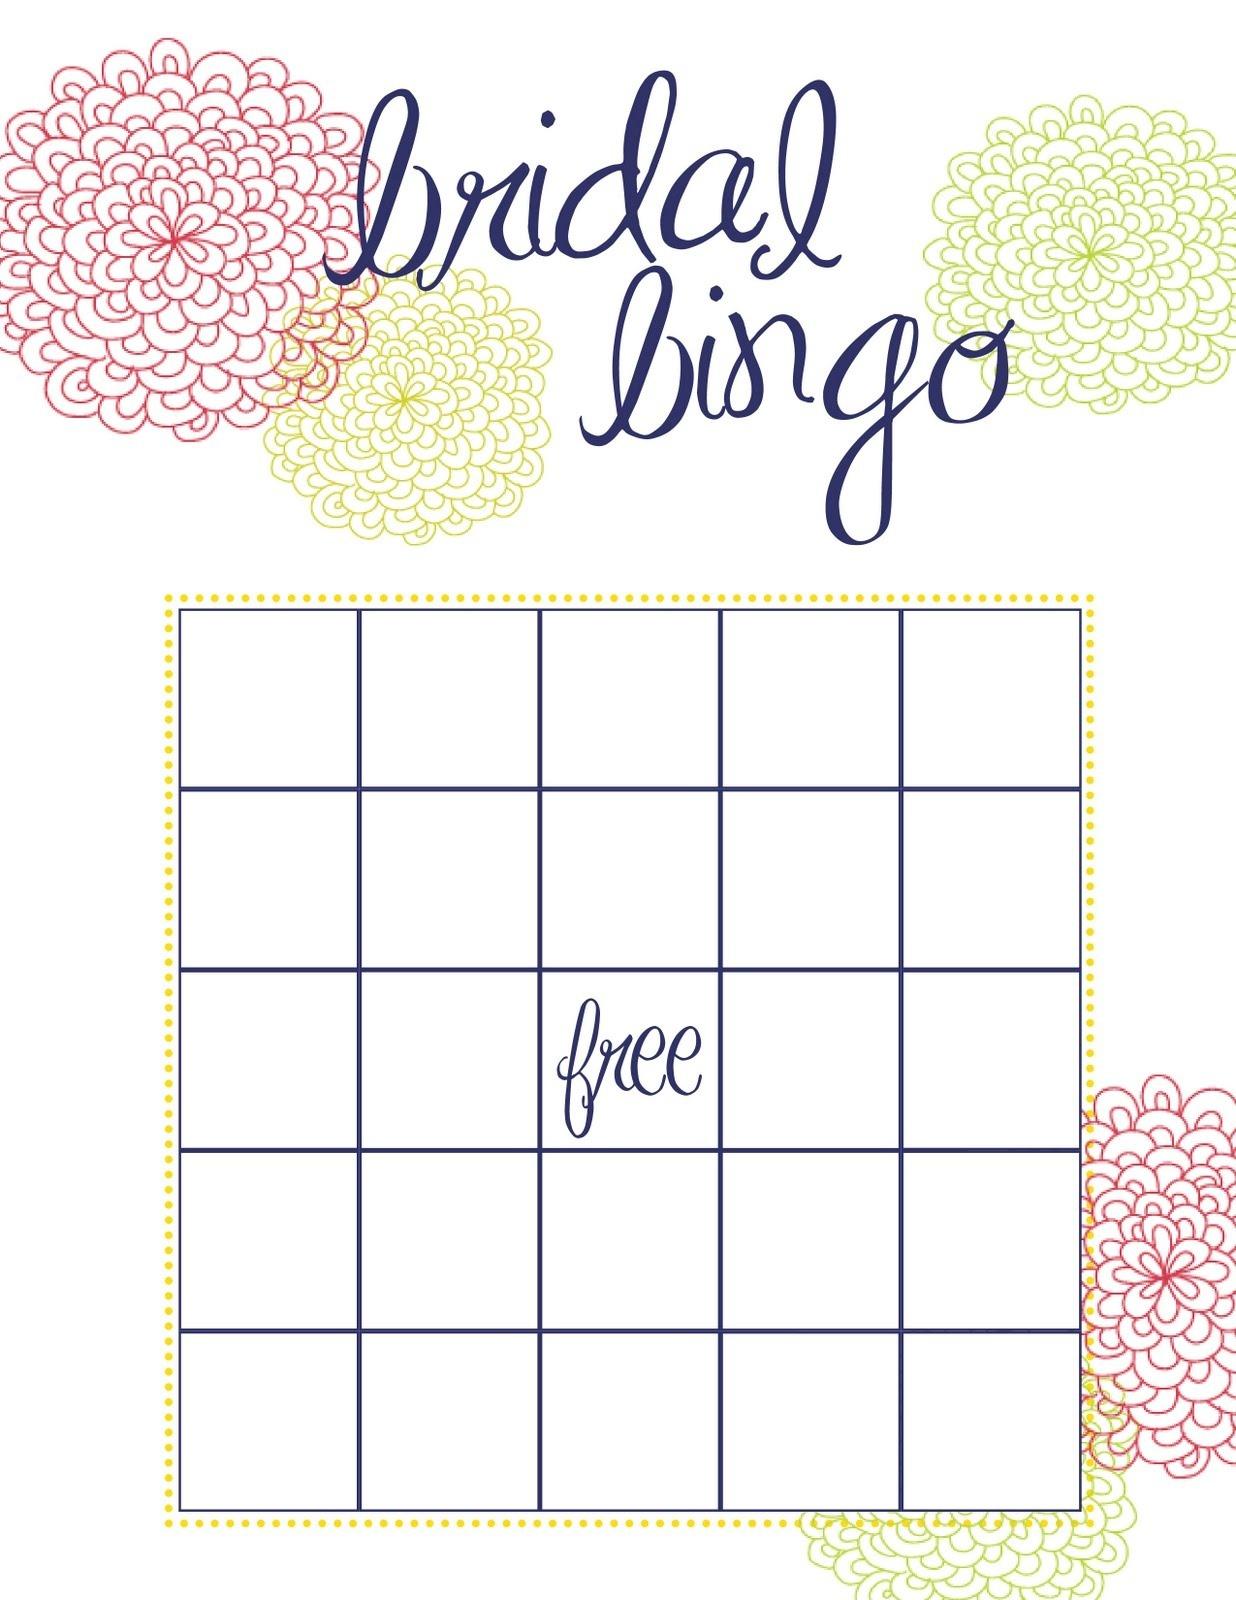 Wedding Shower Bingo Template – 28 Images – 6 Best Images Of Bingo - Free Printable Bridal Shower Bingo